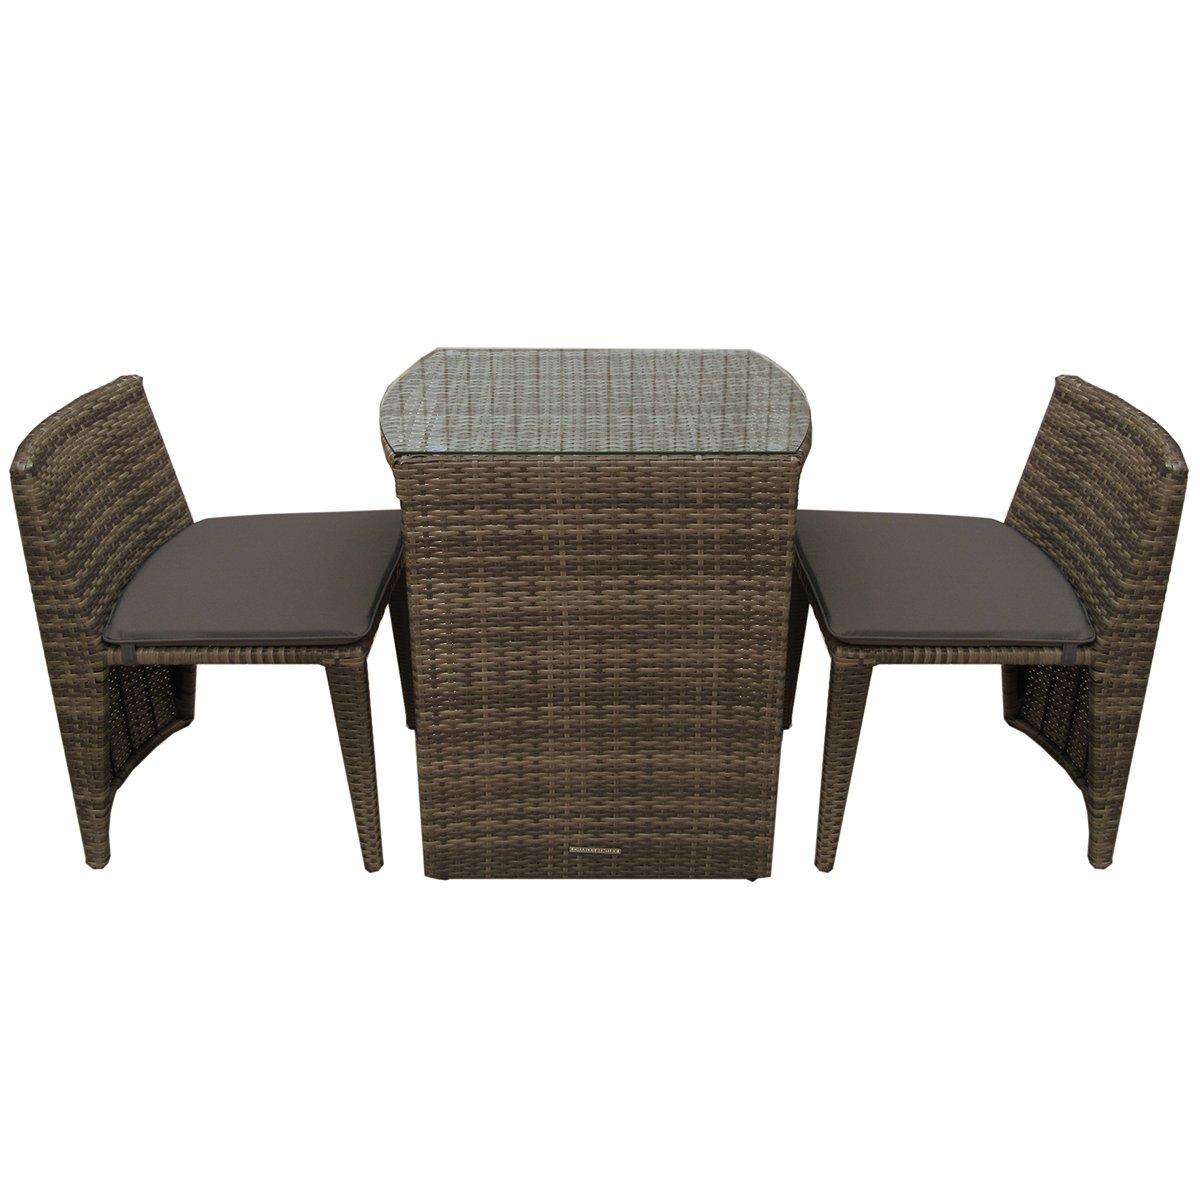 Super 2 Seater Rattan Balcony Bistro Set Brown Dailytribune Chair Design For Home Dailytribuneorg